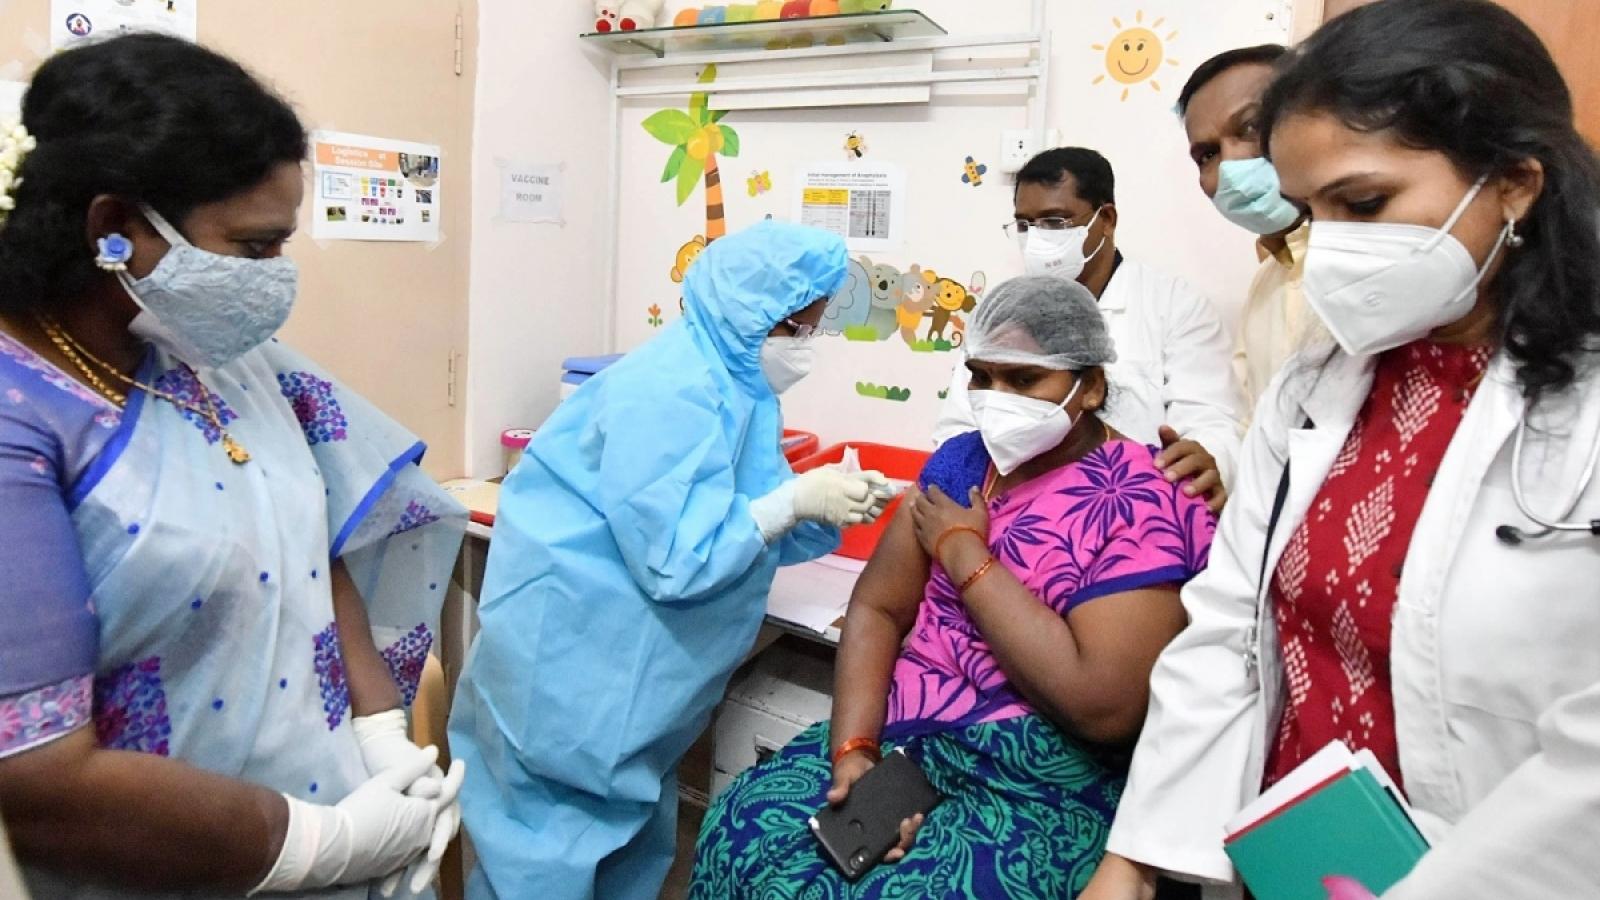 Ấn Độ chuẩn bị triển khai tiêm vaccine Covid-19